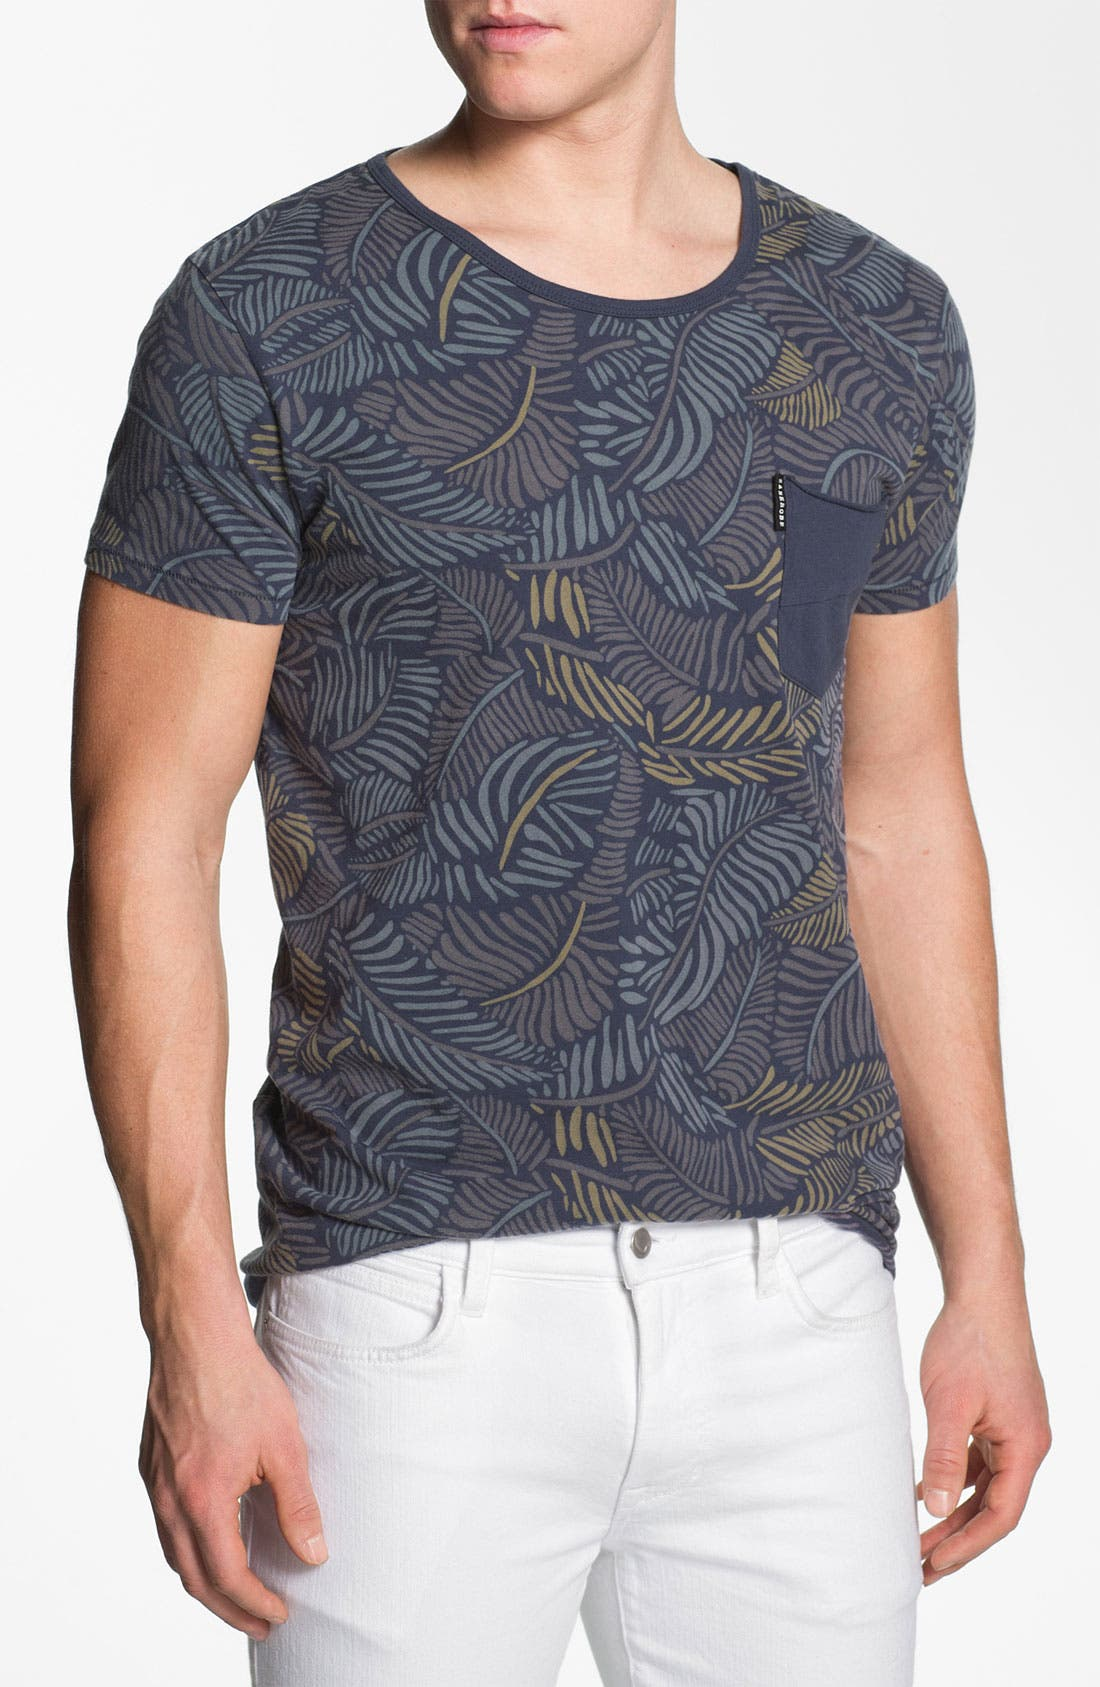 Alternate Image 1 Selected - Zanerobe 'Poleho' Allover Print Pocket T-Shirt